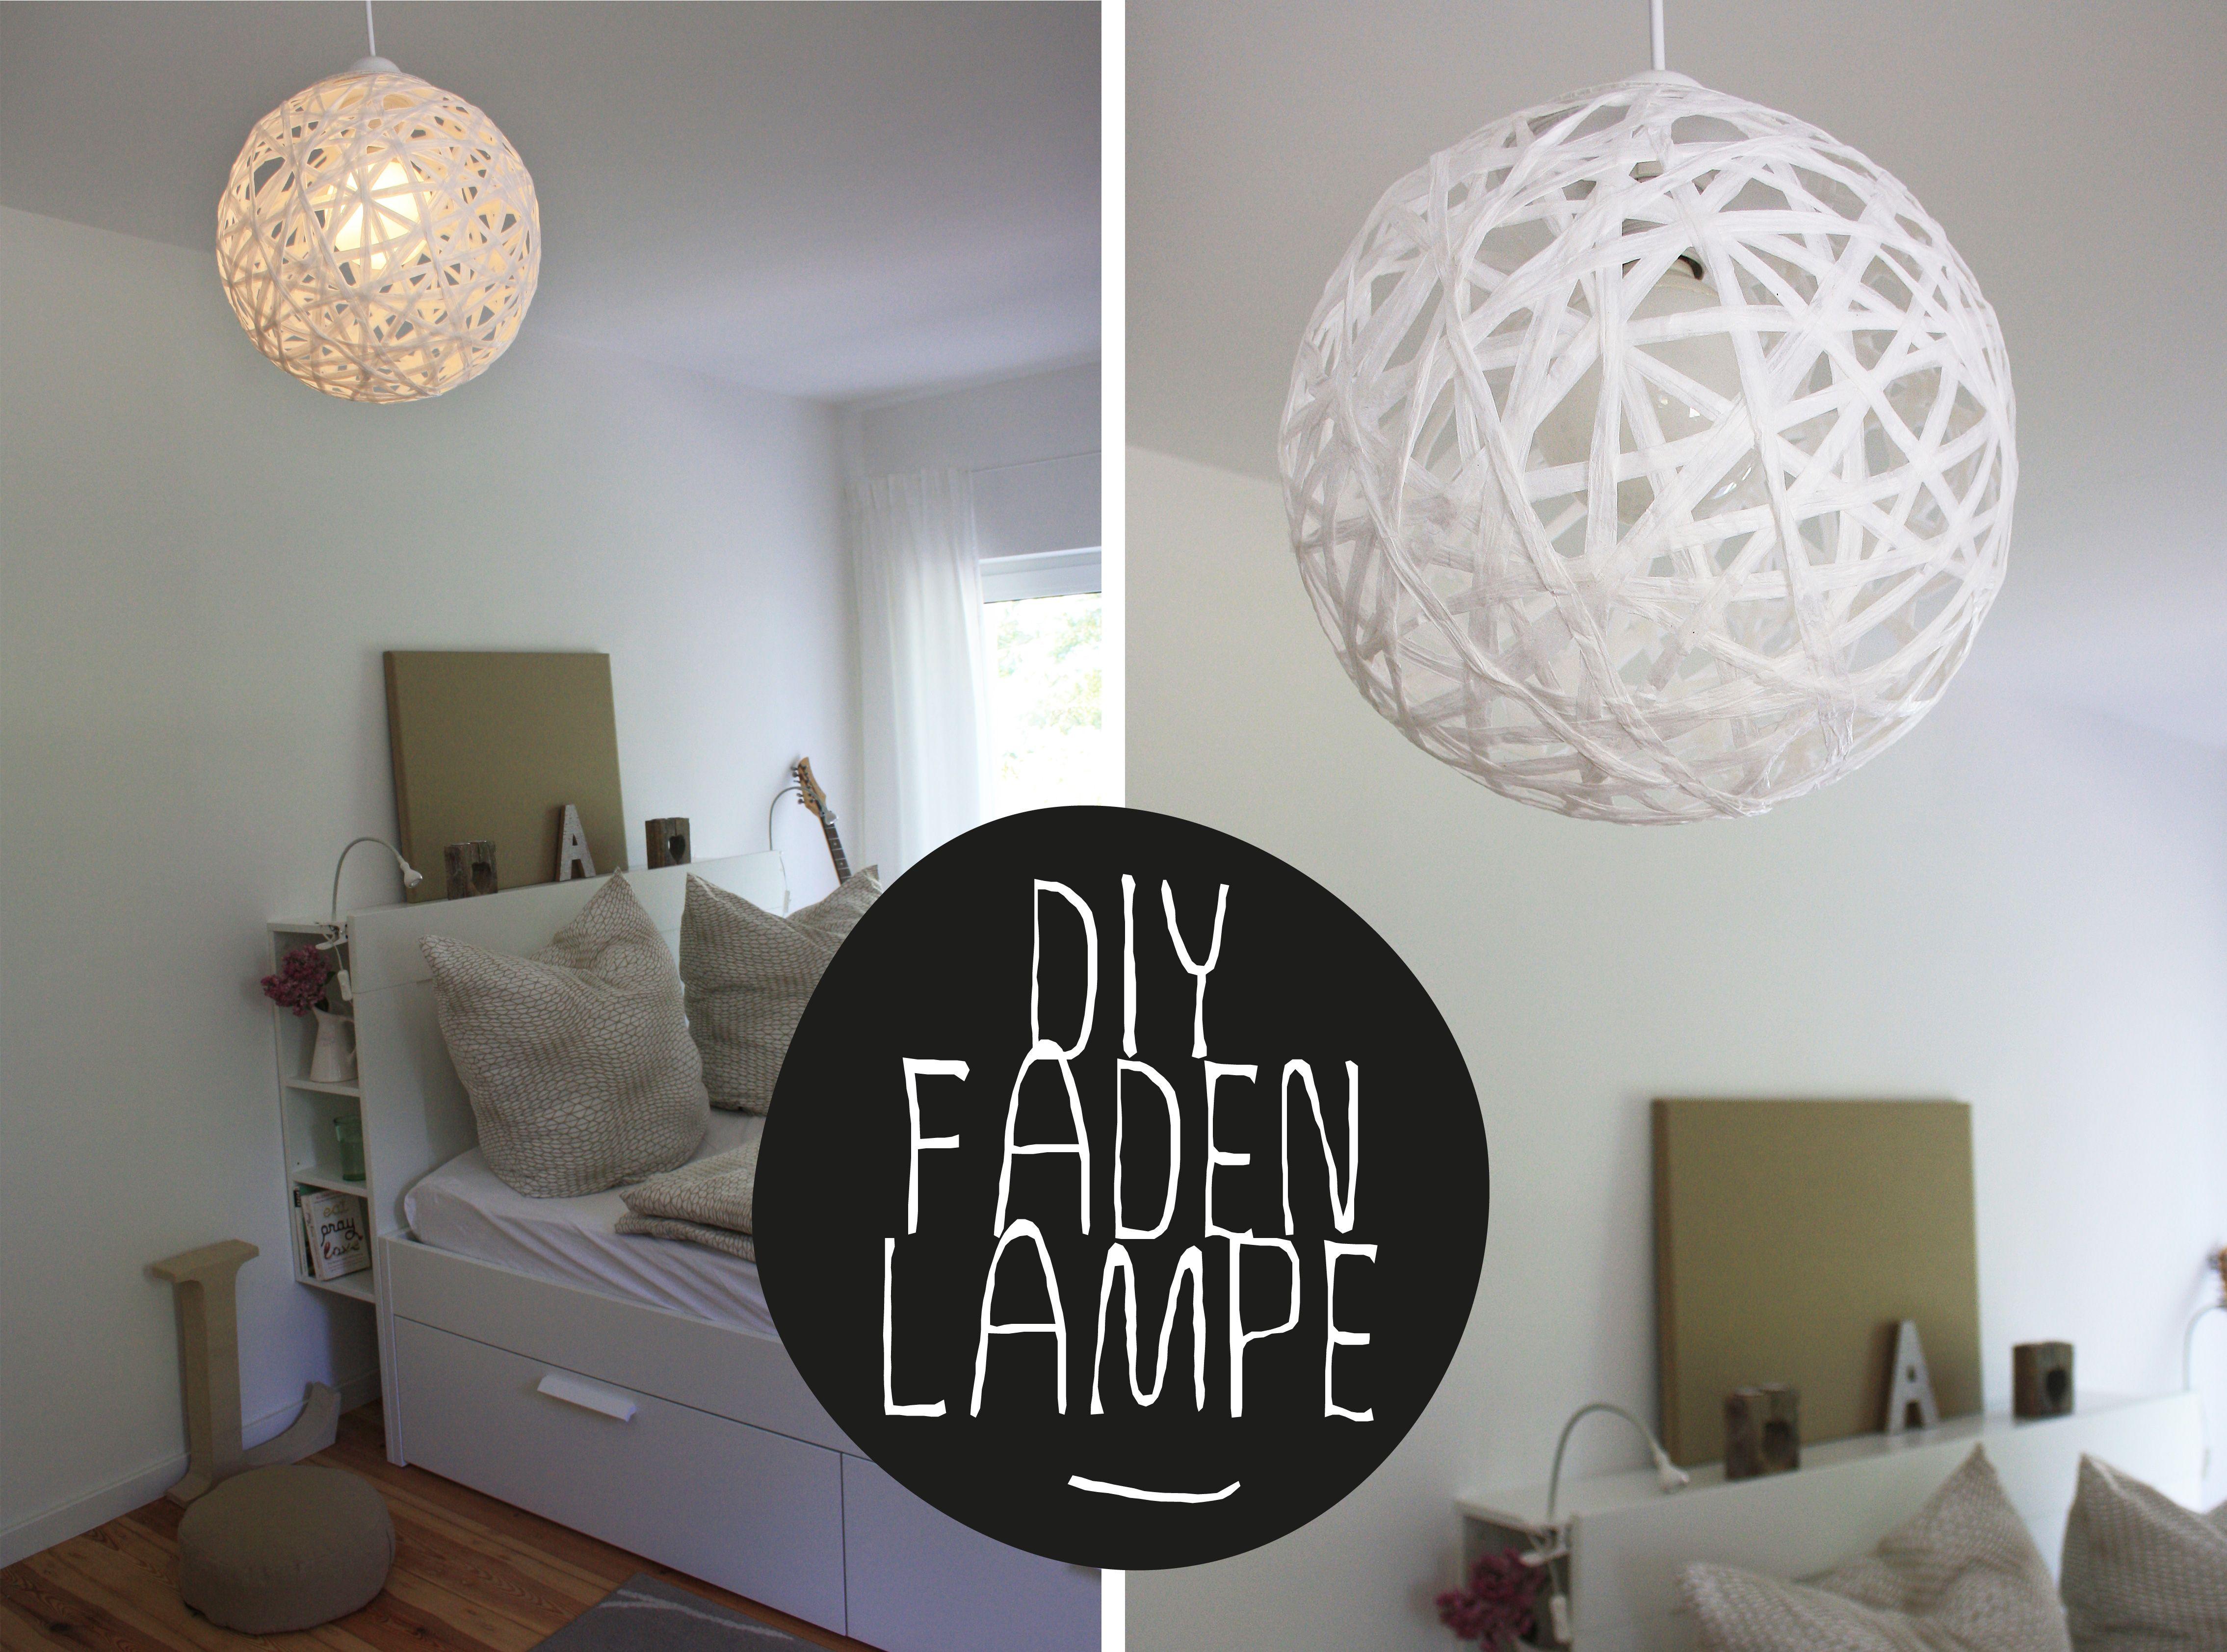 Diy Bast Faden Schnur Lampe Lampenschirm Basteln Haus Deko Lampen